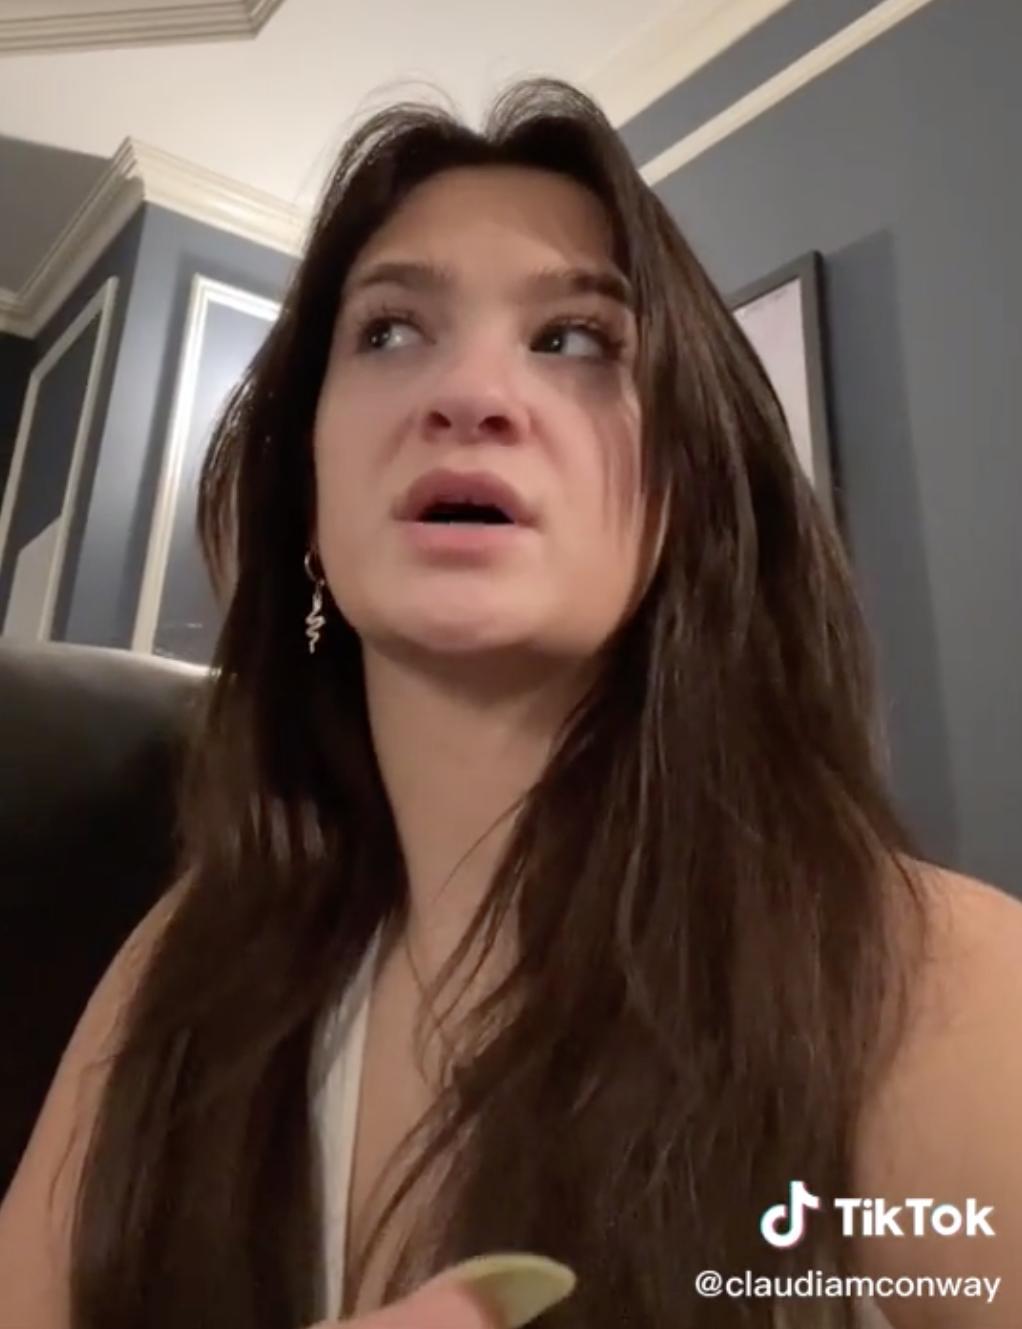 Screenshot of Claudia from Claudia's TikTok